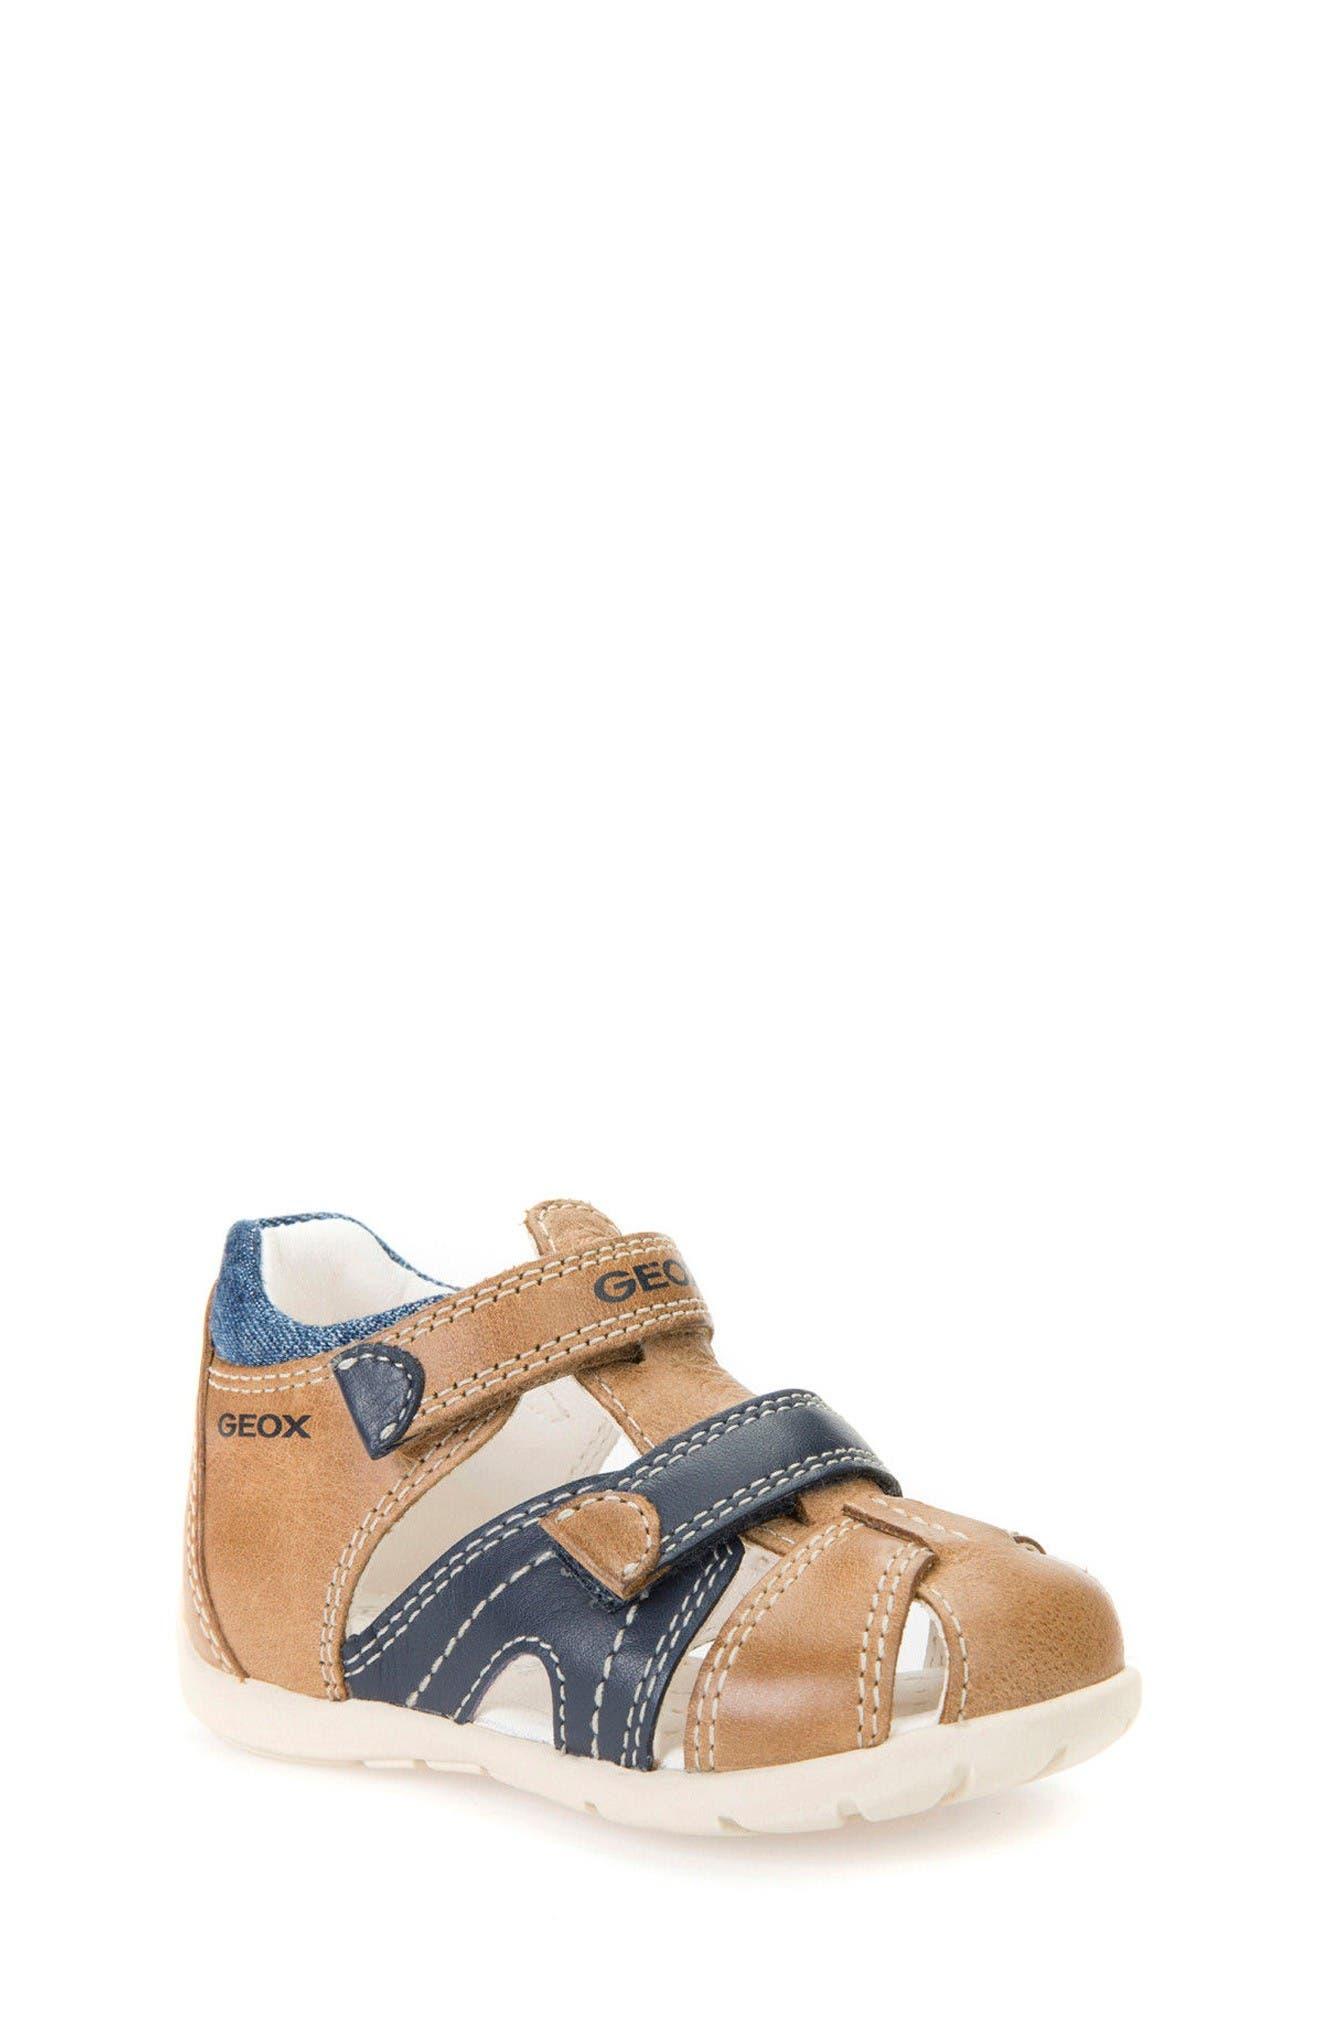 GEOX 'Kaytan' Sandal